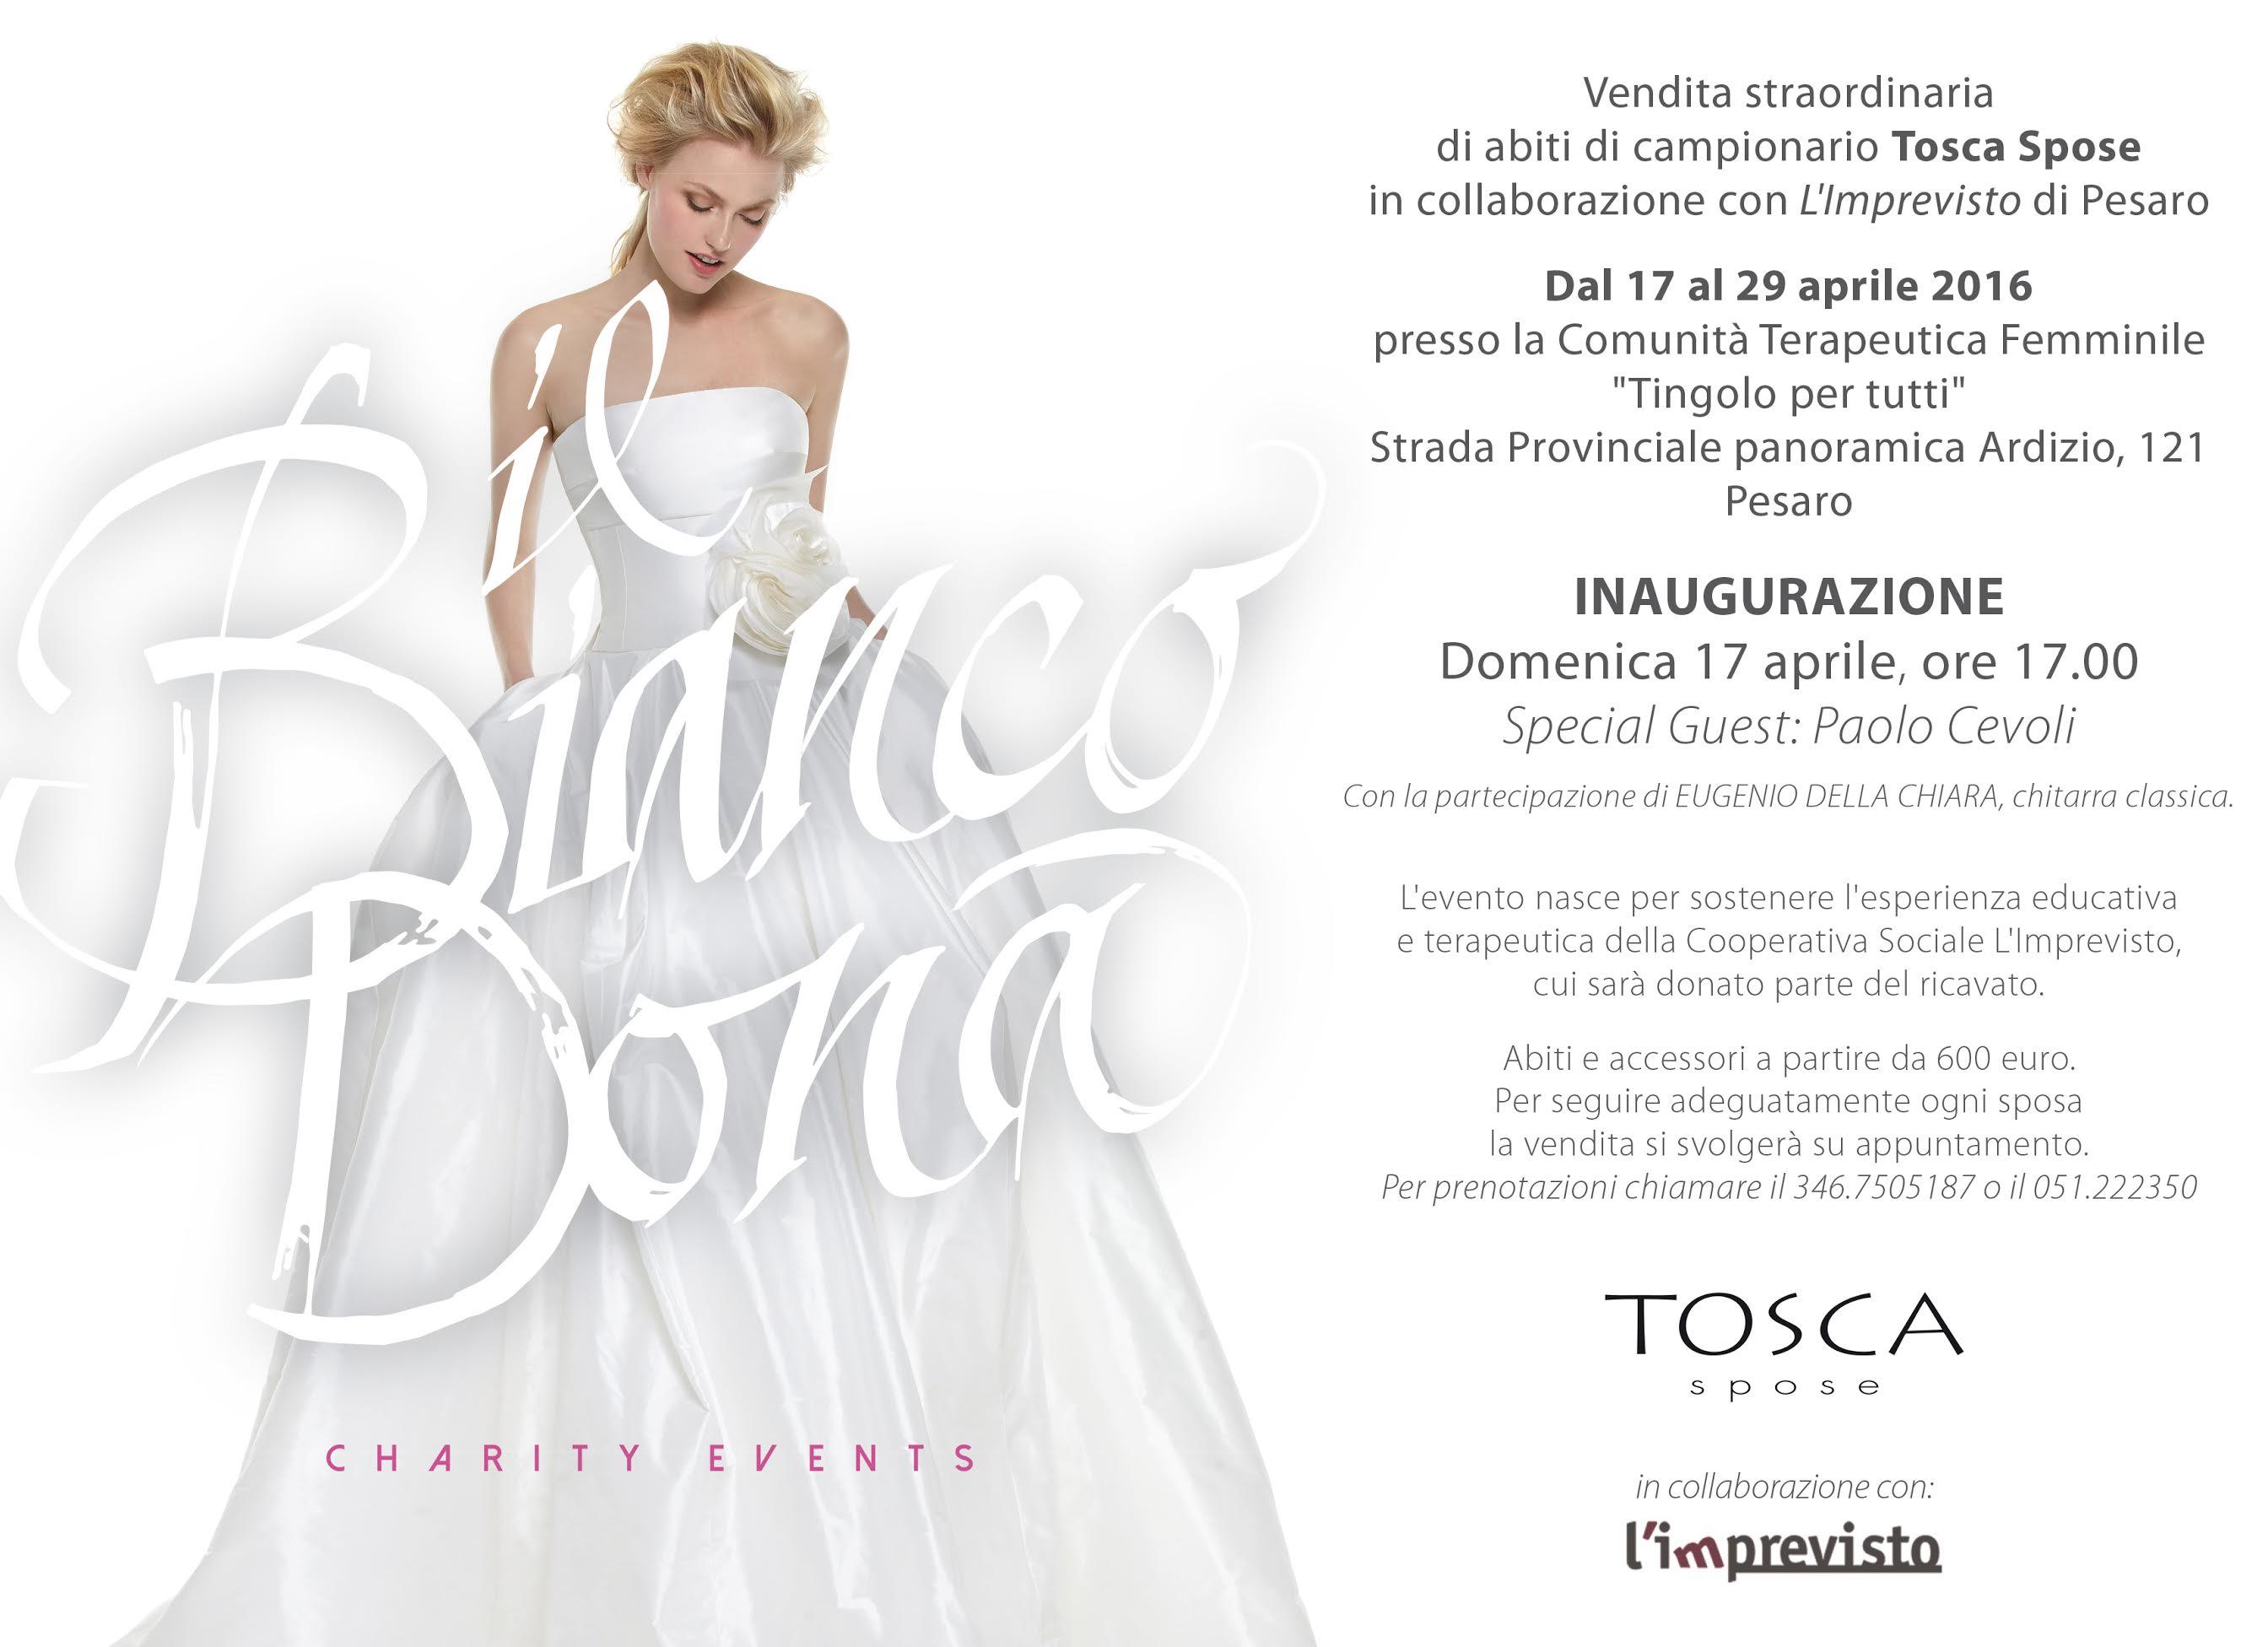 Il Bianco Dona - Pesaro dal 17 al 29 Aprile